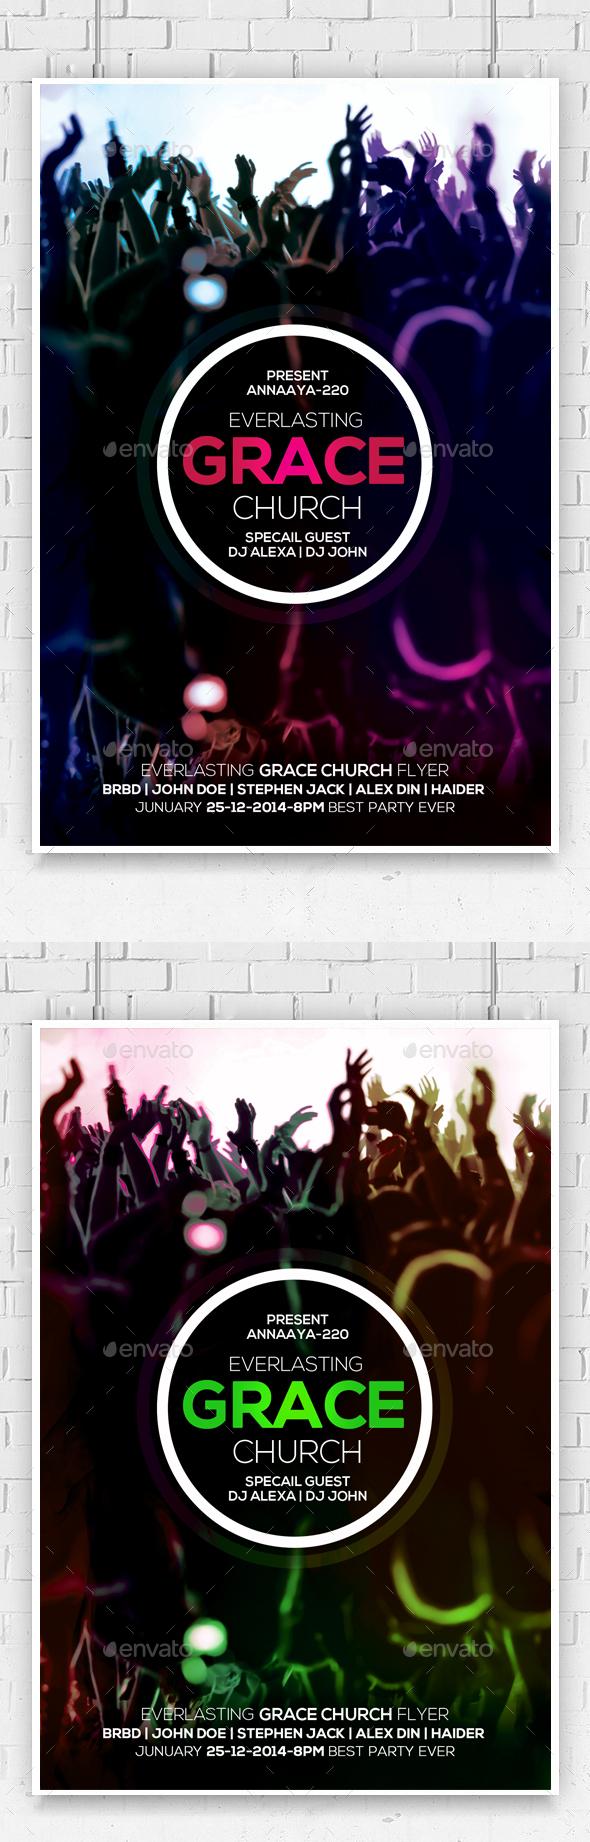 Everlasting Grace Church Flyer  - Church Flyers